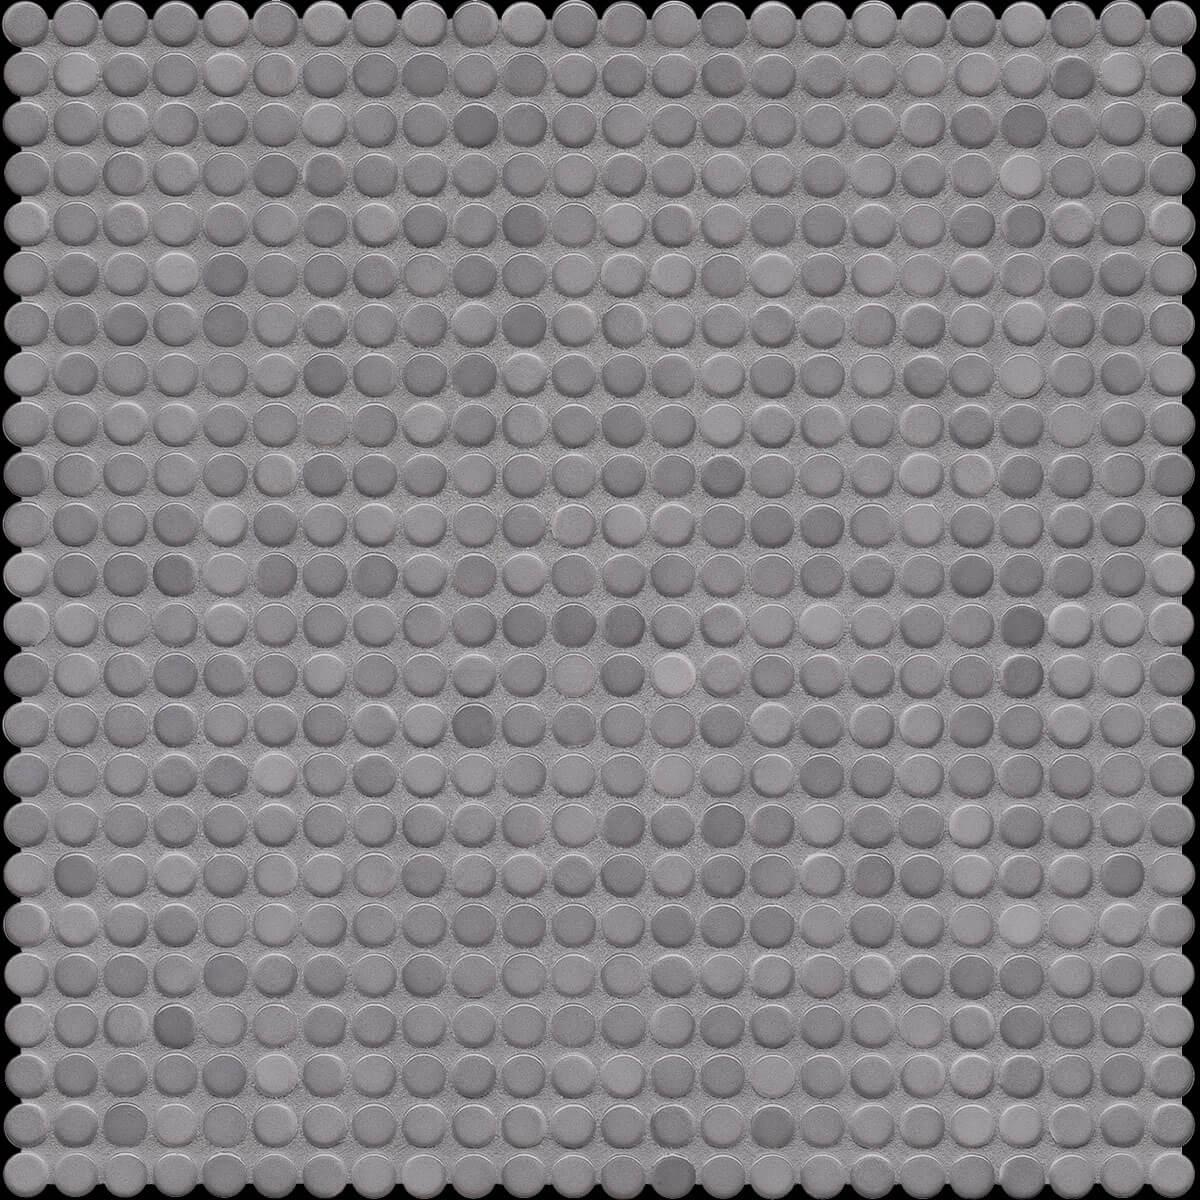 Agrob Buchtal Tiles - KLAY_Loop-_0009_40005H